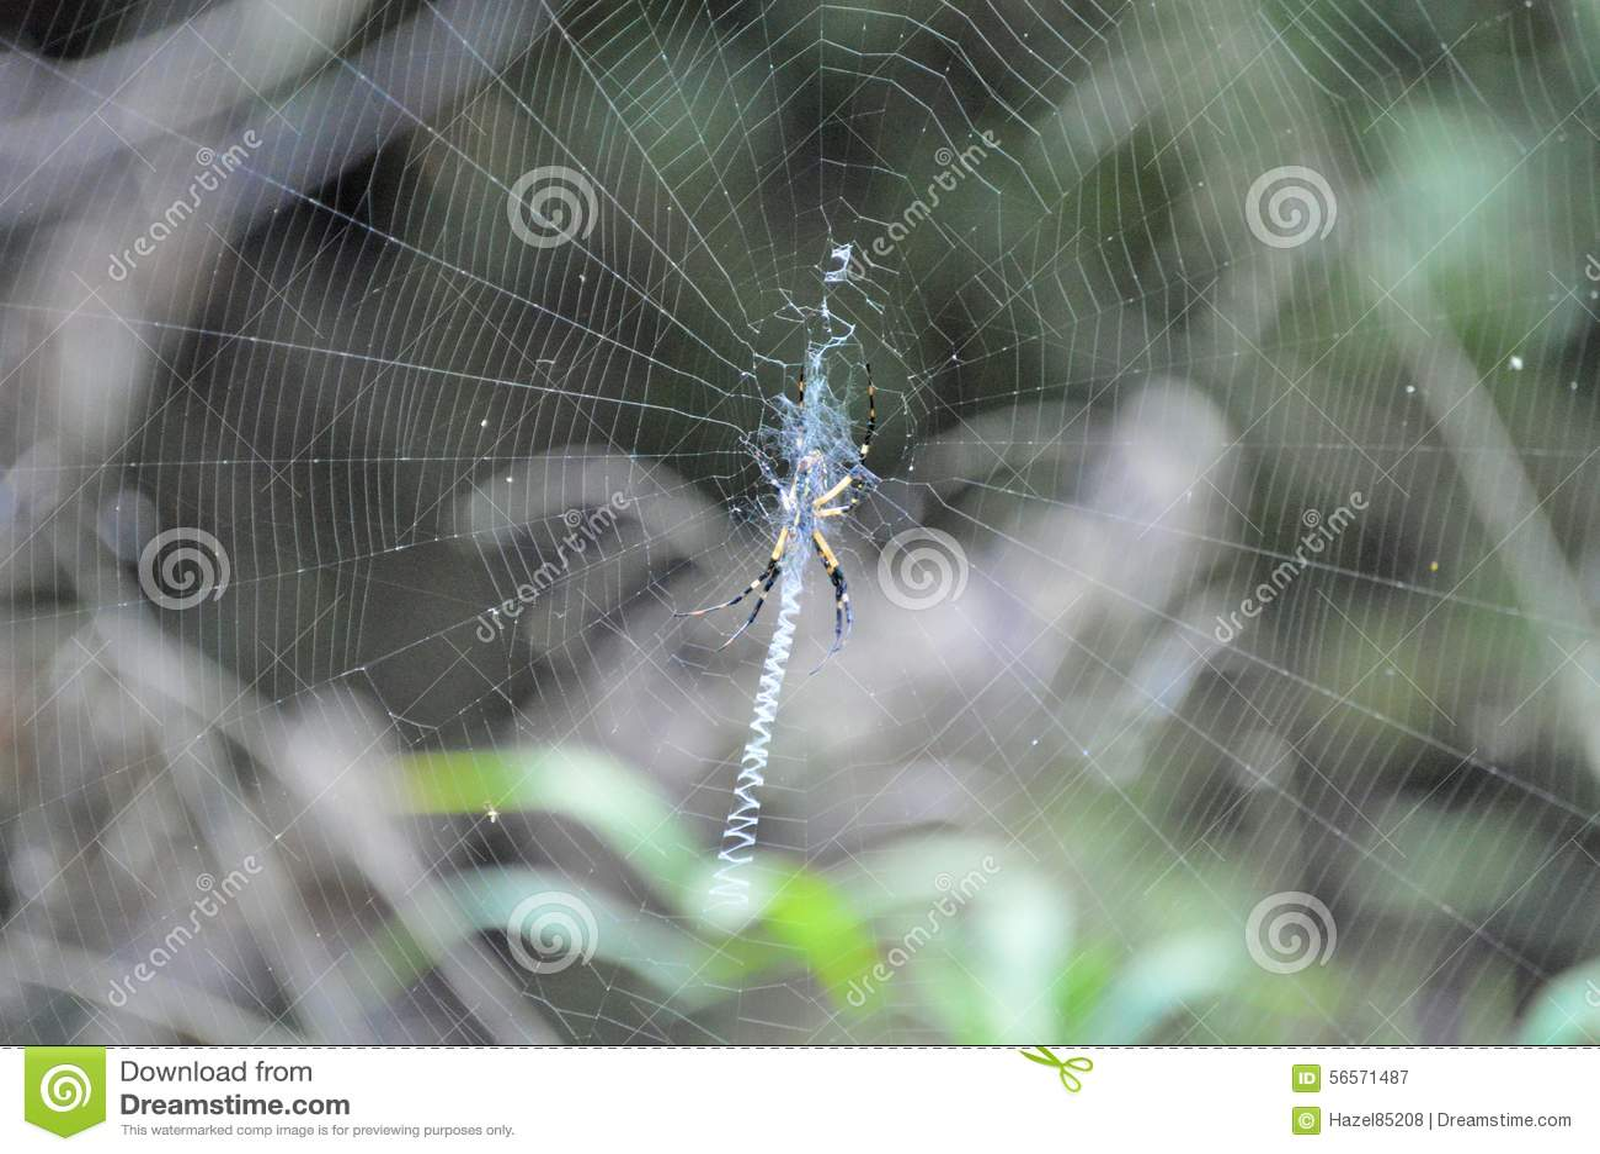 Download Αράχνη στον Ιστό που δημιουργεί το σχέδιο Στοκ Εικόνα - εικόνα από δάσος, λεπτομέρεια: 56571487